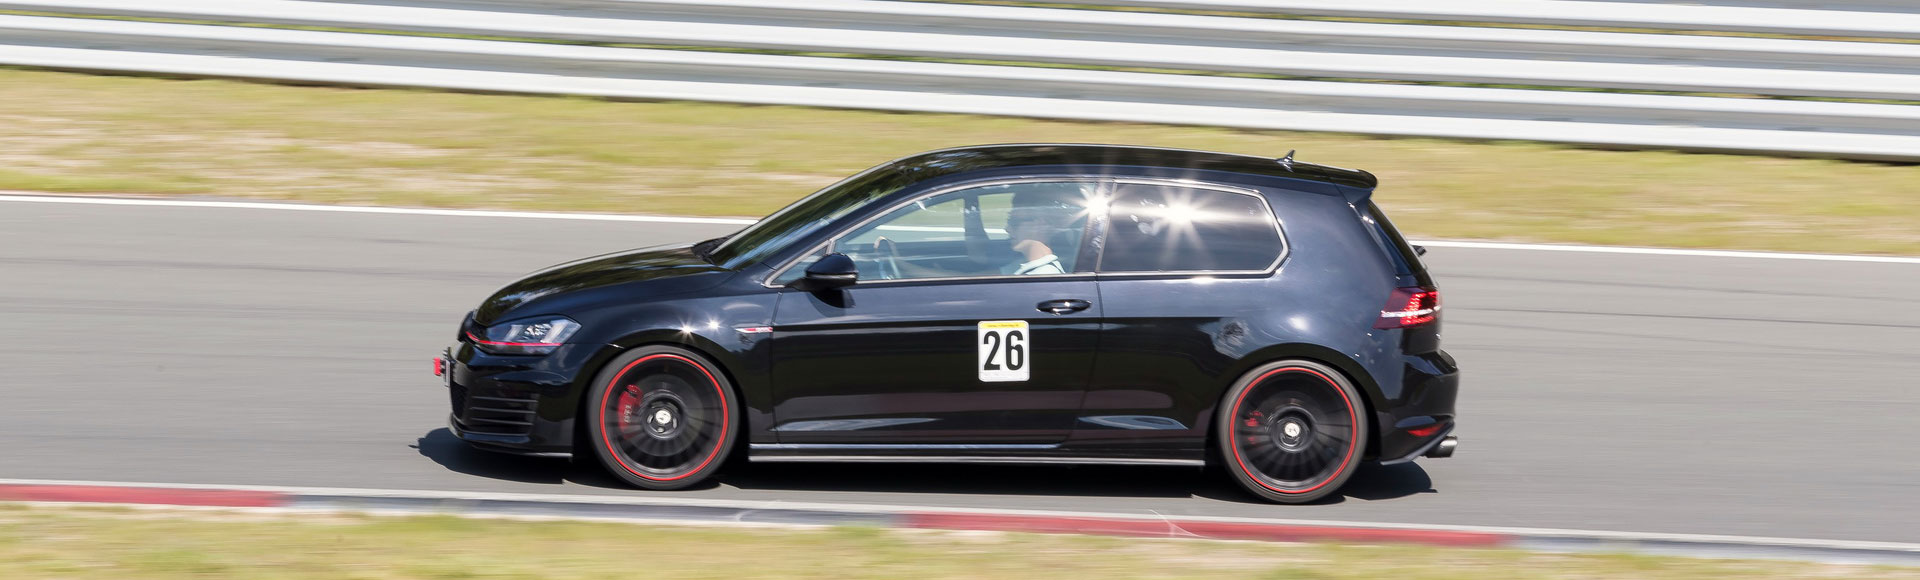 X Leasing Bilster Berg 2017 2535 2017 VW Golf GTI